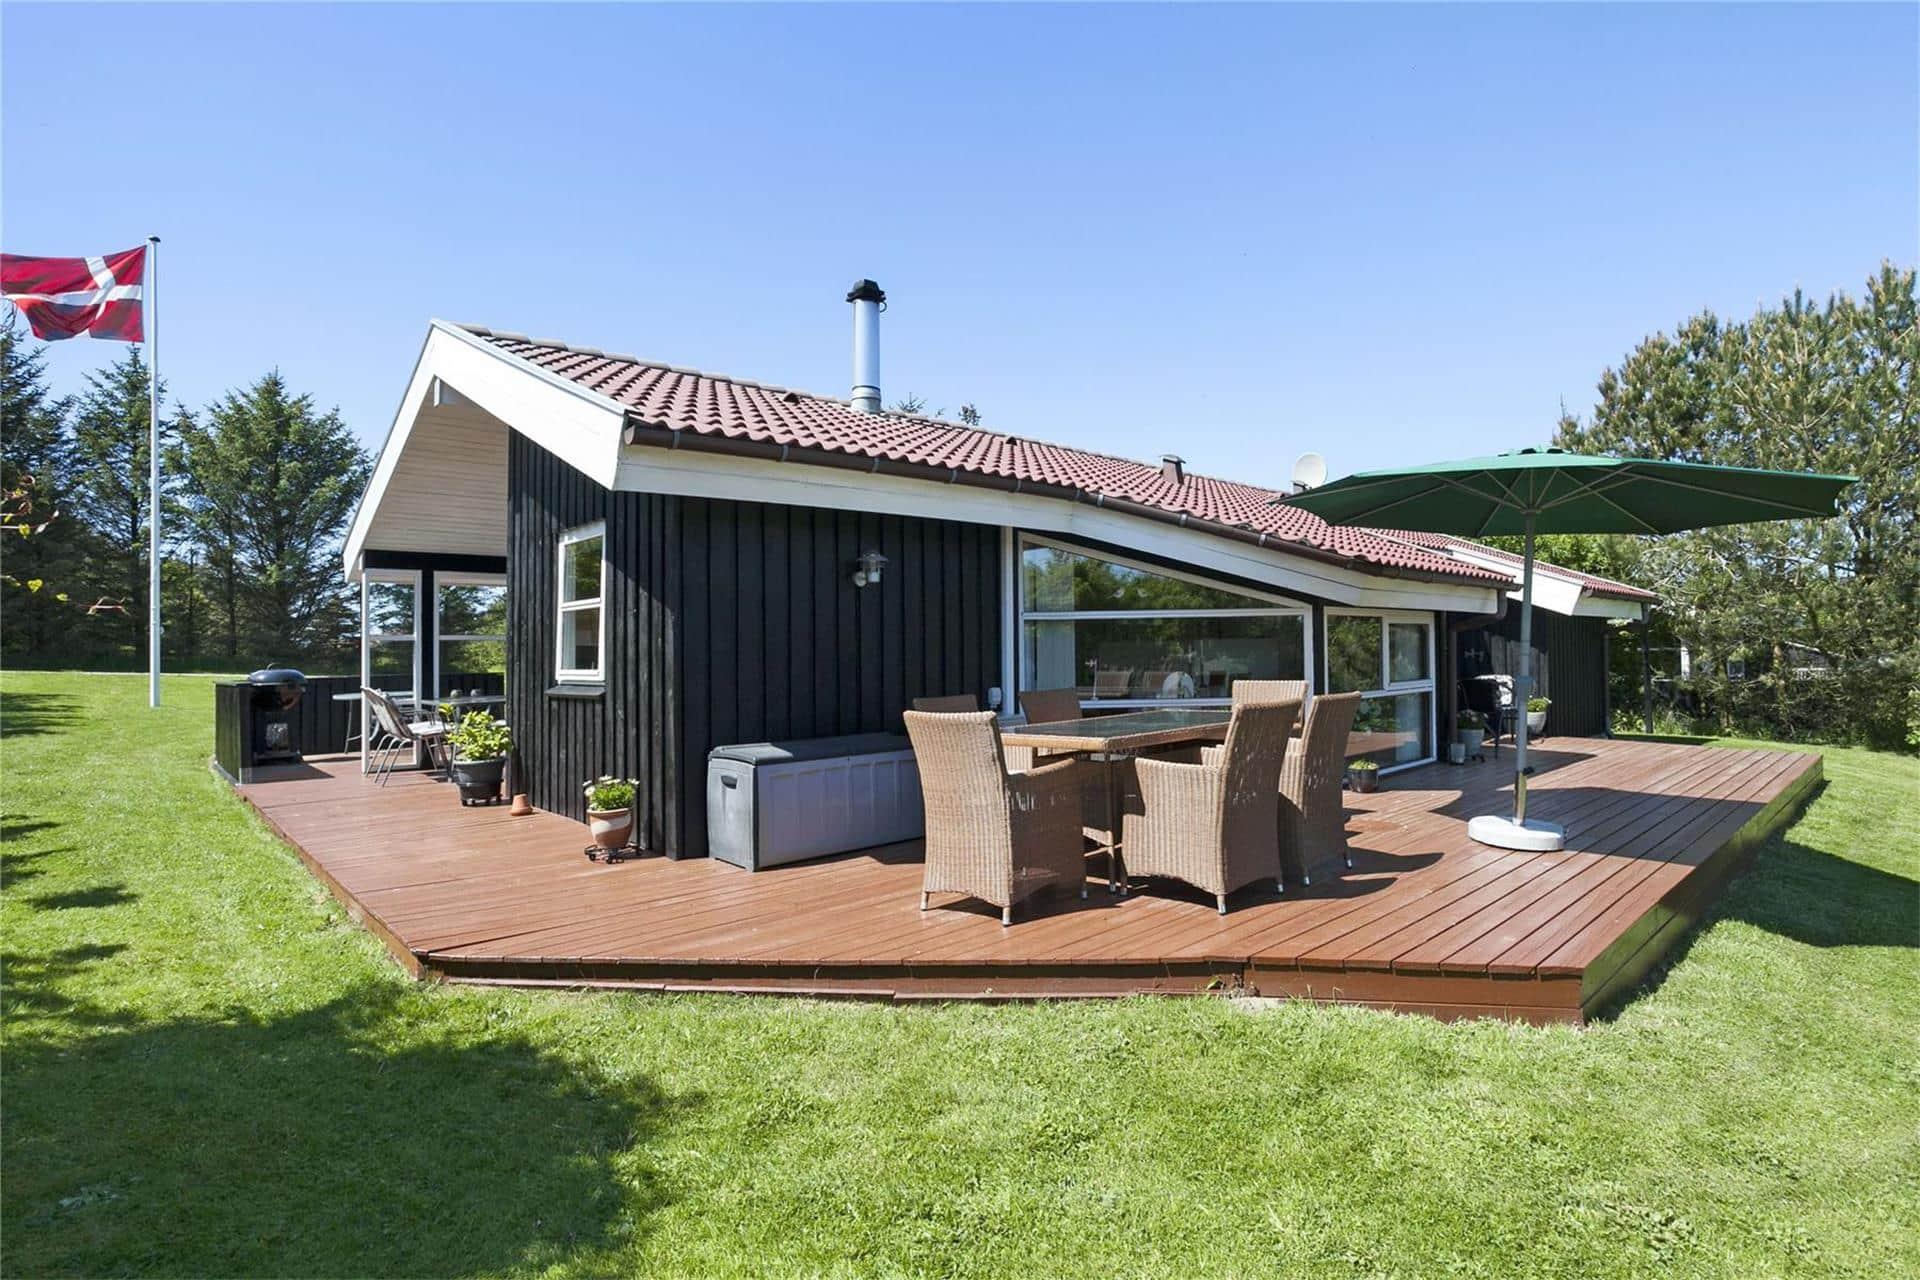 Afbeelding 1-178 Vakantiehuis LN694, Høngårdsvej 26, DK - 9800 Hjørring